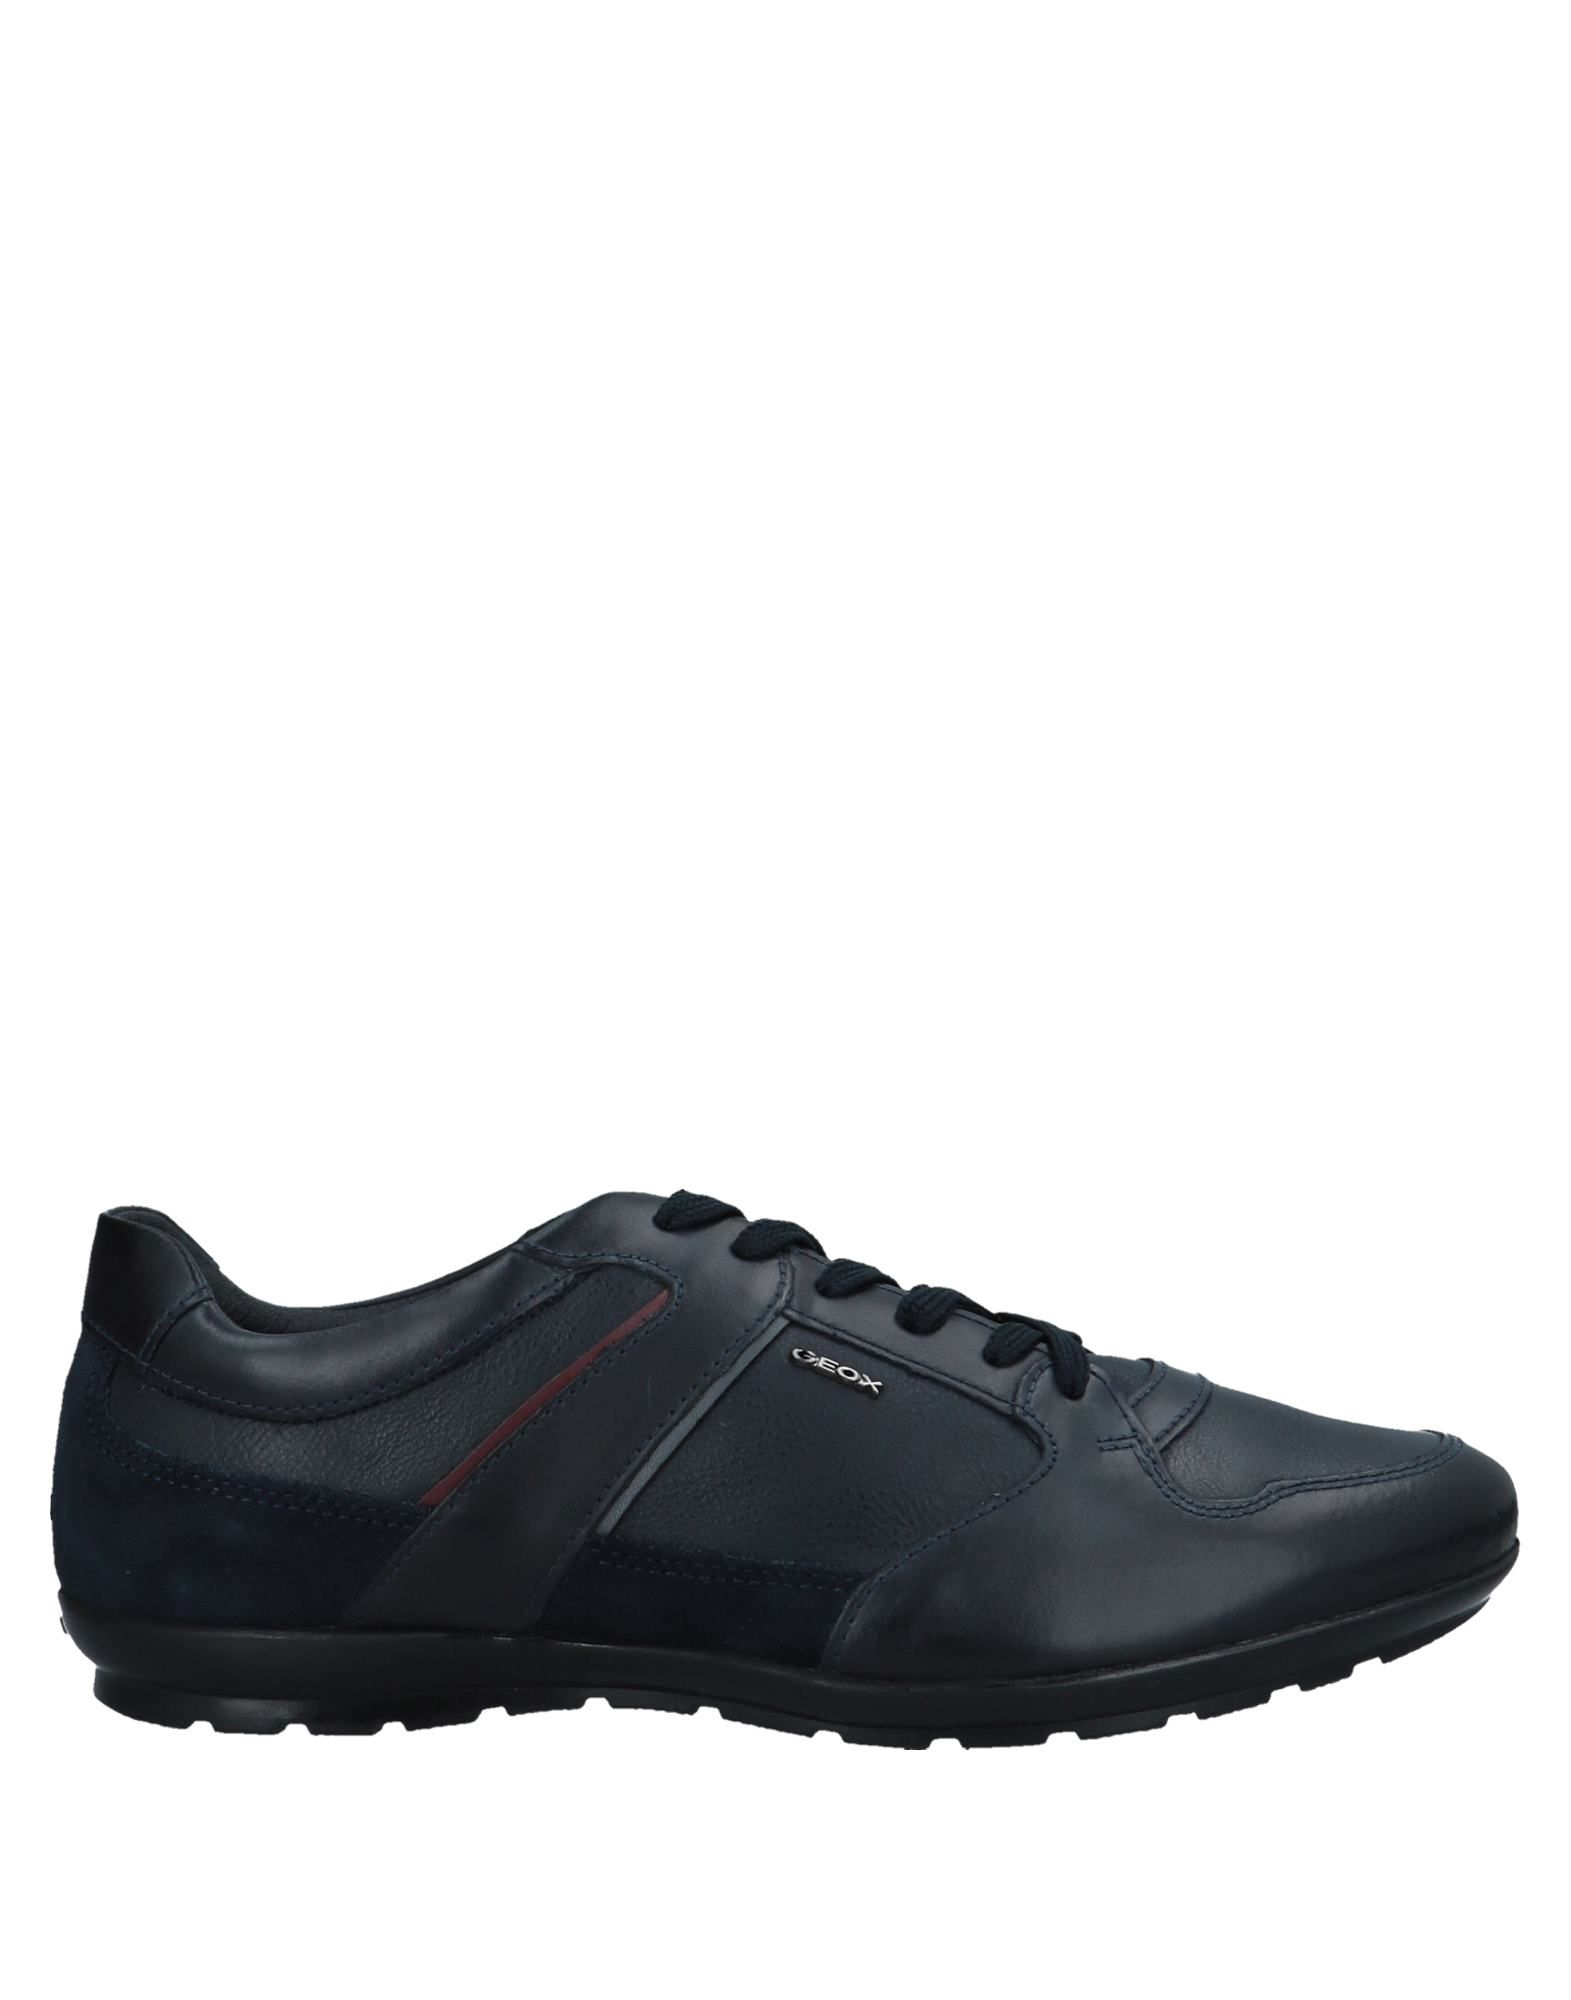 Geox Sneakers Herren  Schuhe 11540762FD Heiße Schuhe  d7176f